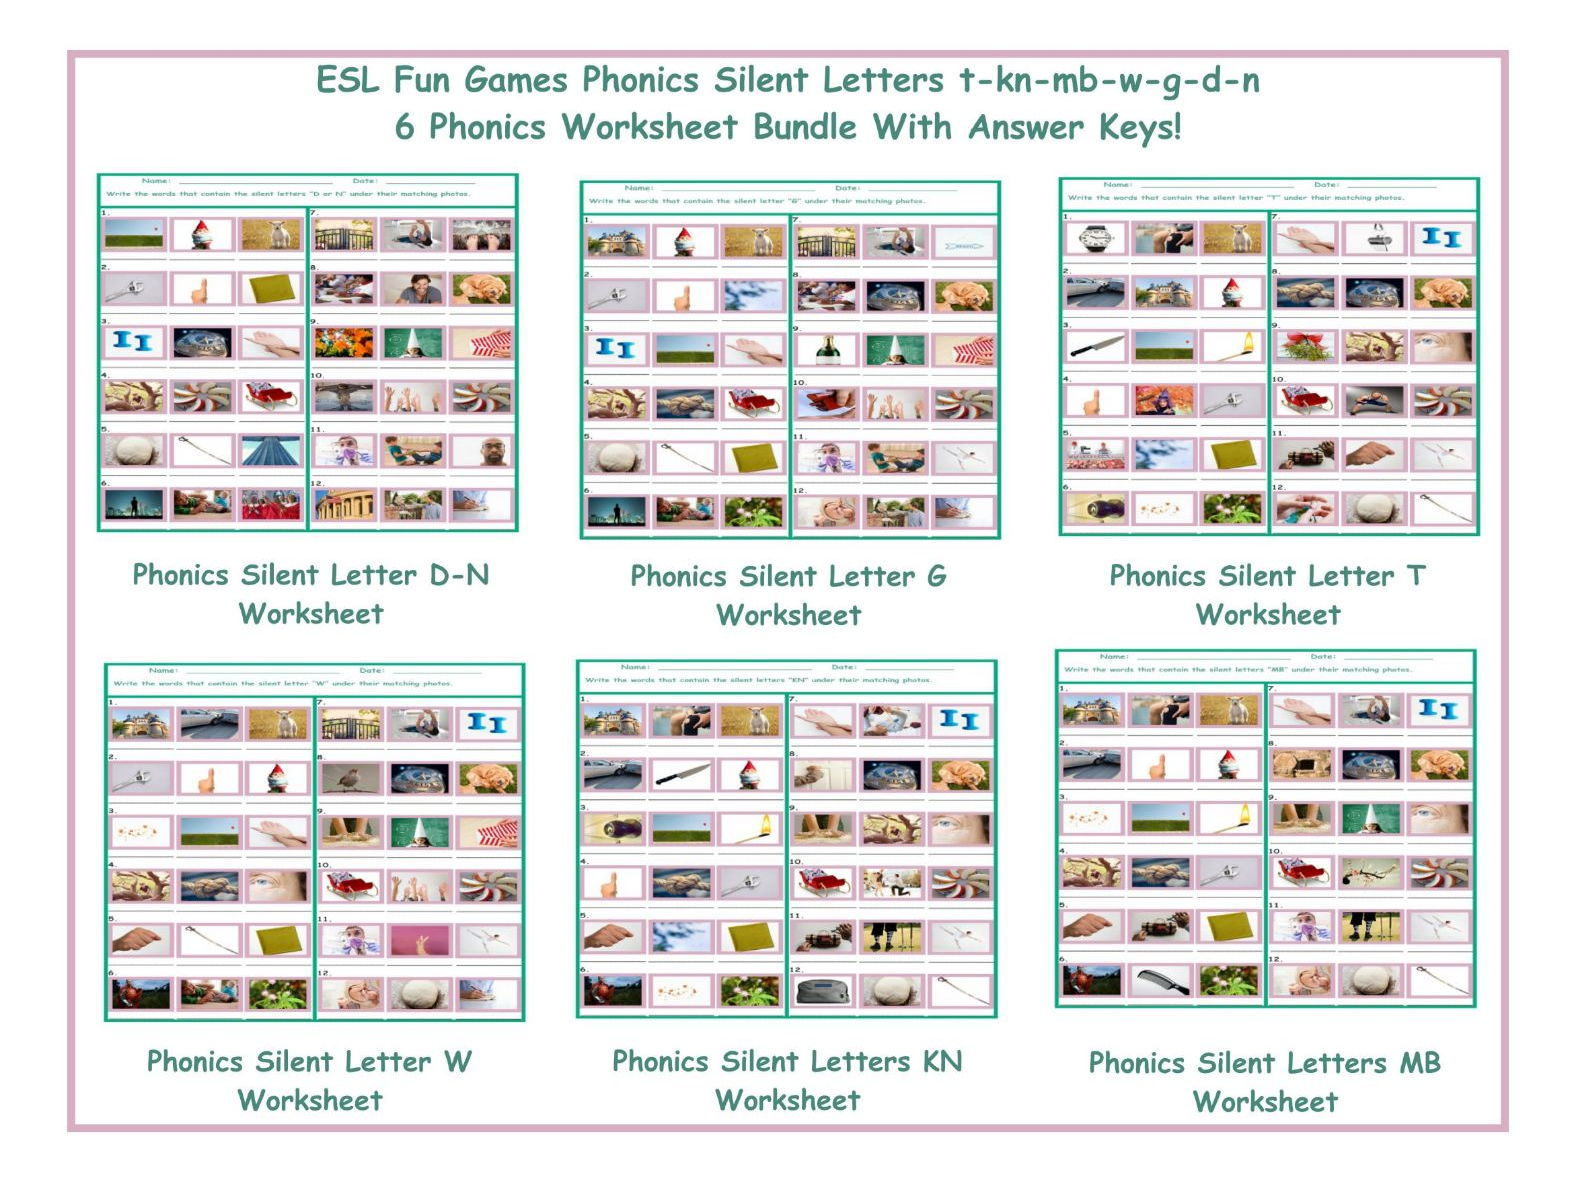 Workbooks kn sound worksheets : Phonics Silent Letters KN Worksheet by eslfungames - Teaching ...